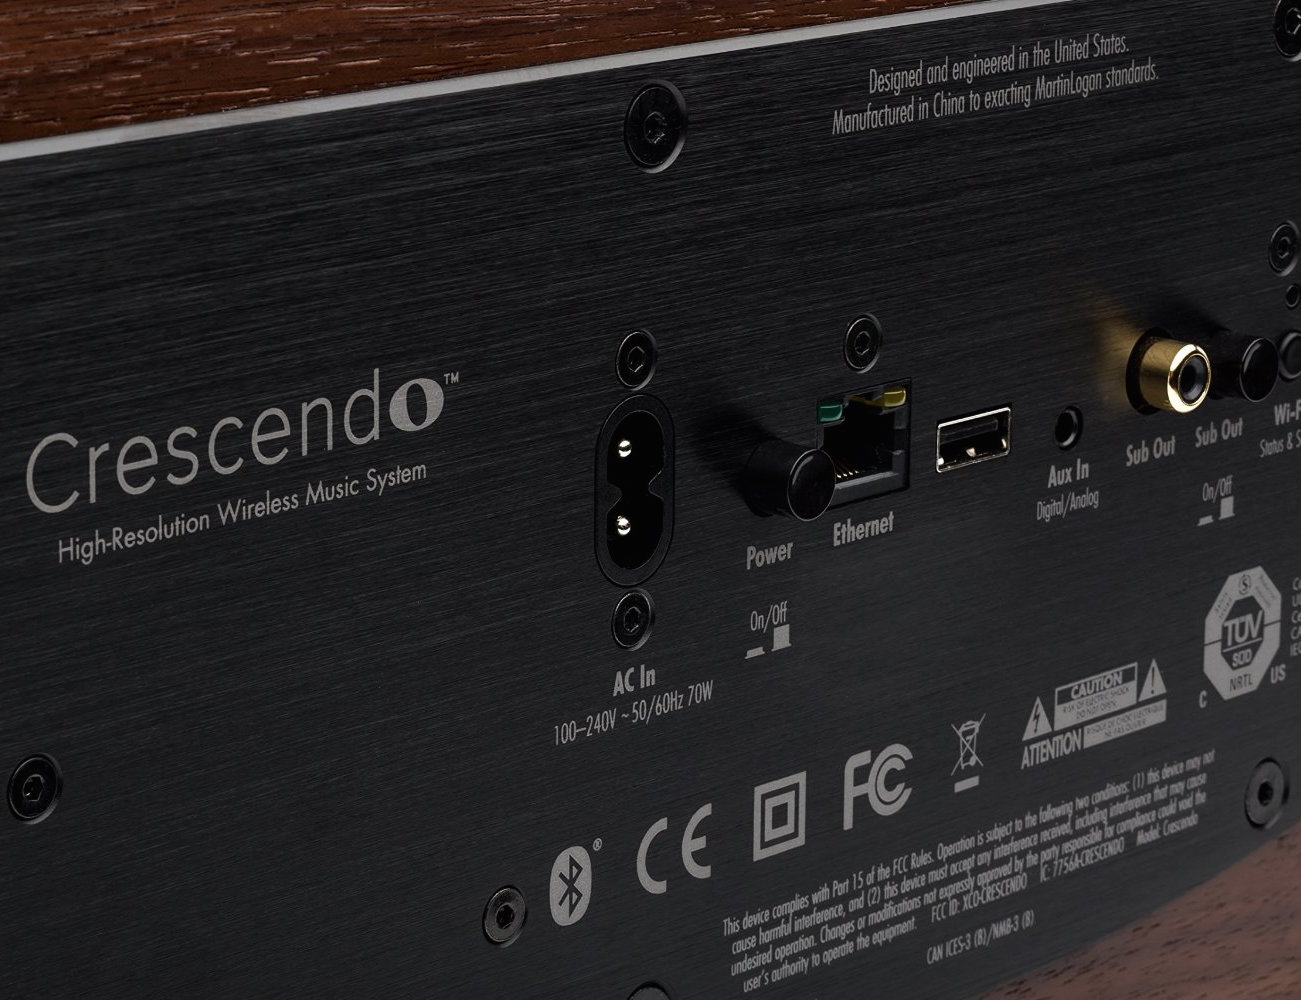 Crescendo – Walnut Premium Wireless Music System by MartinLogan